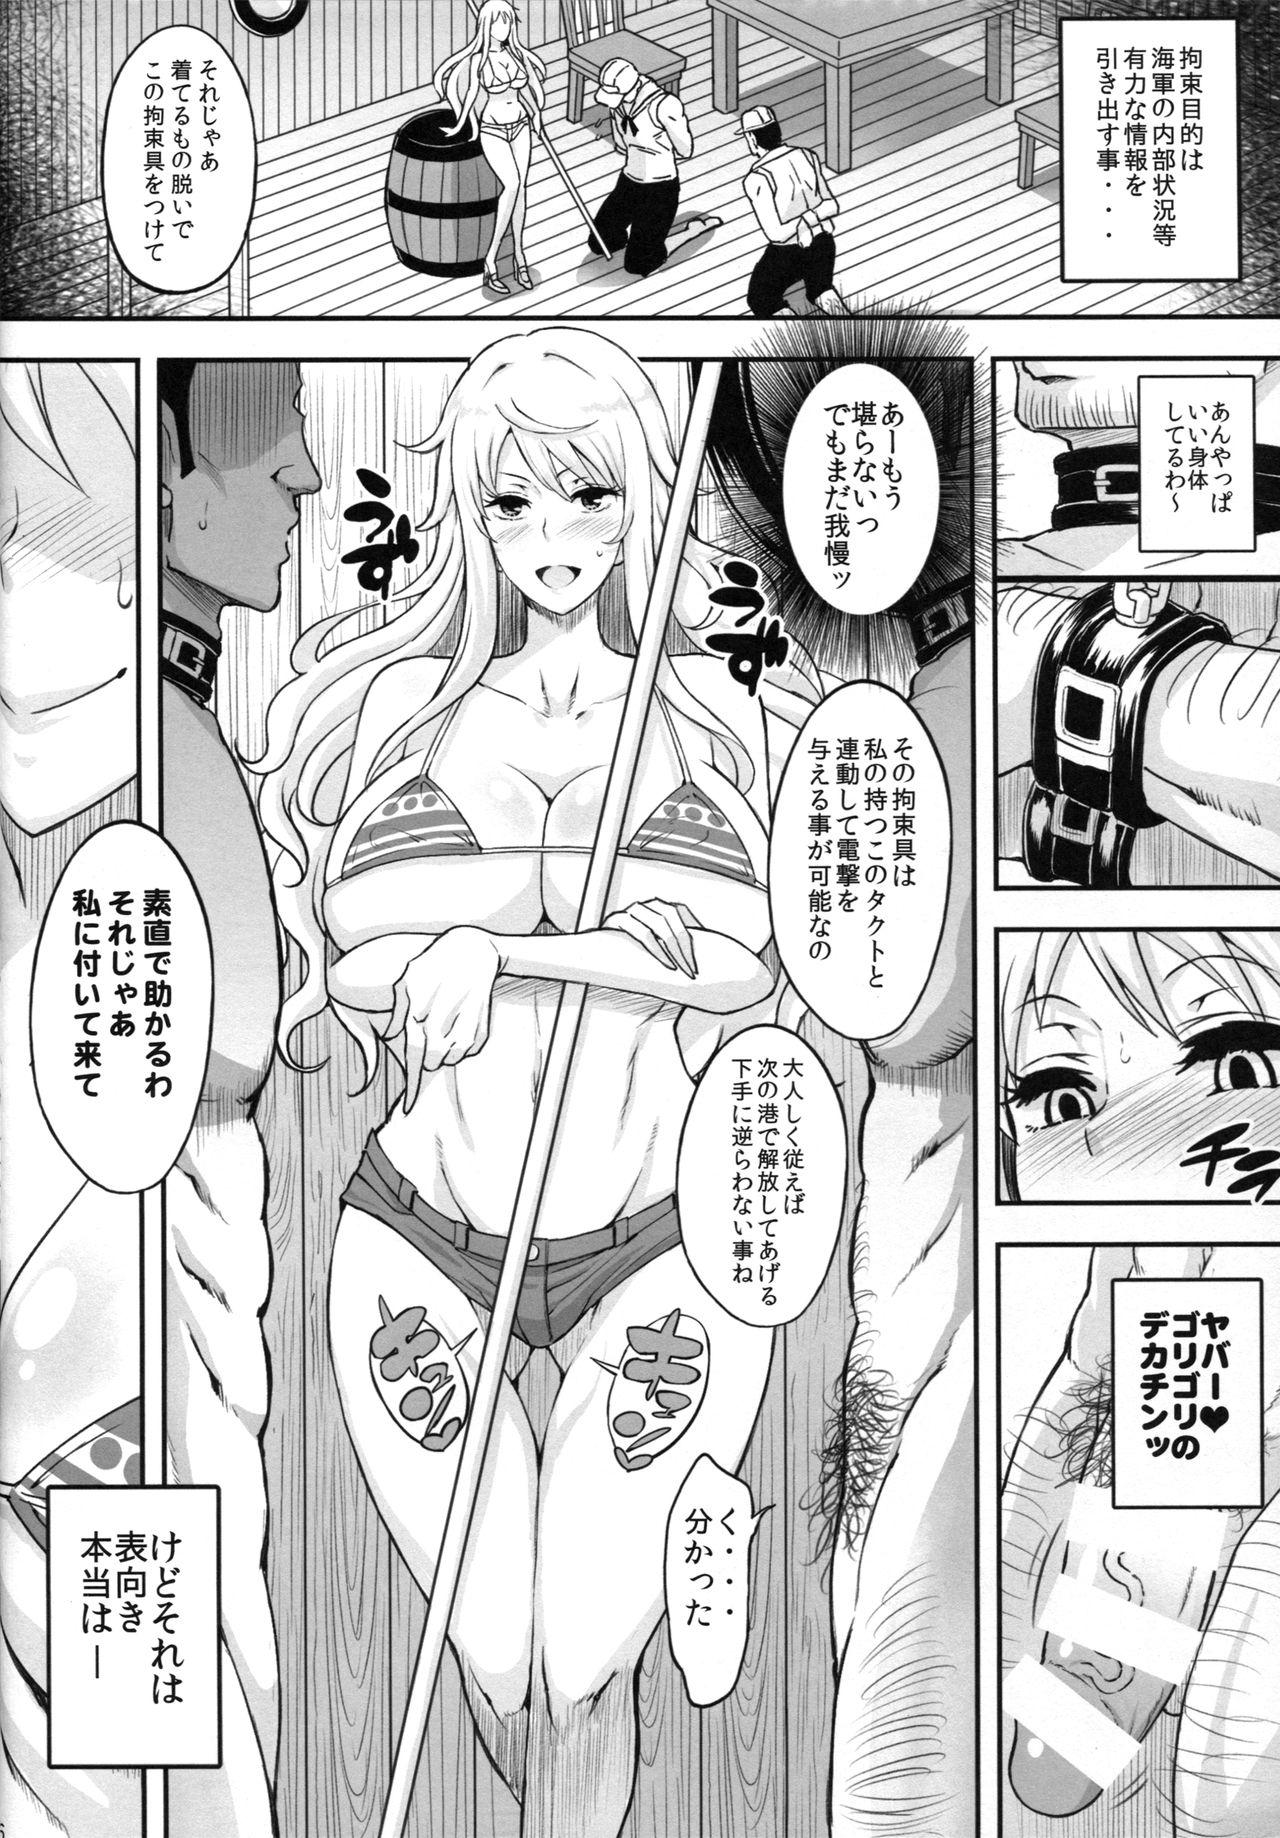 Rakuen Onna Kaizoku 5 - Women Pirate in Paradise 4